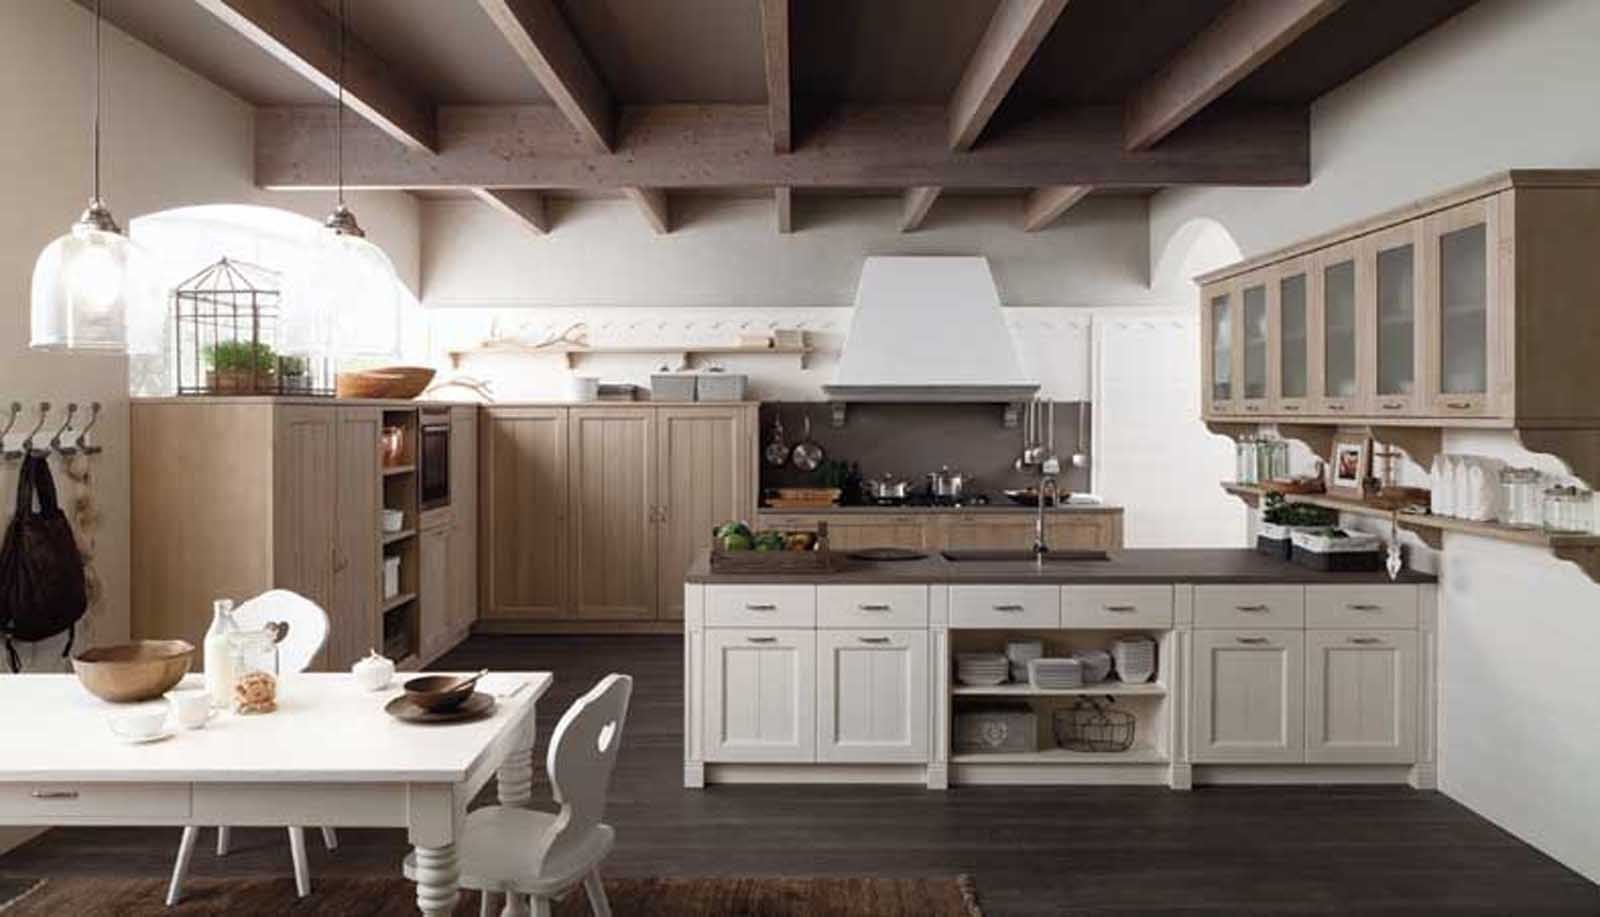 Cucine country una scelta di stile cose di casa for Cucina 150 cm